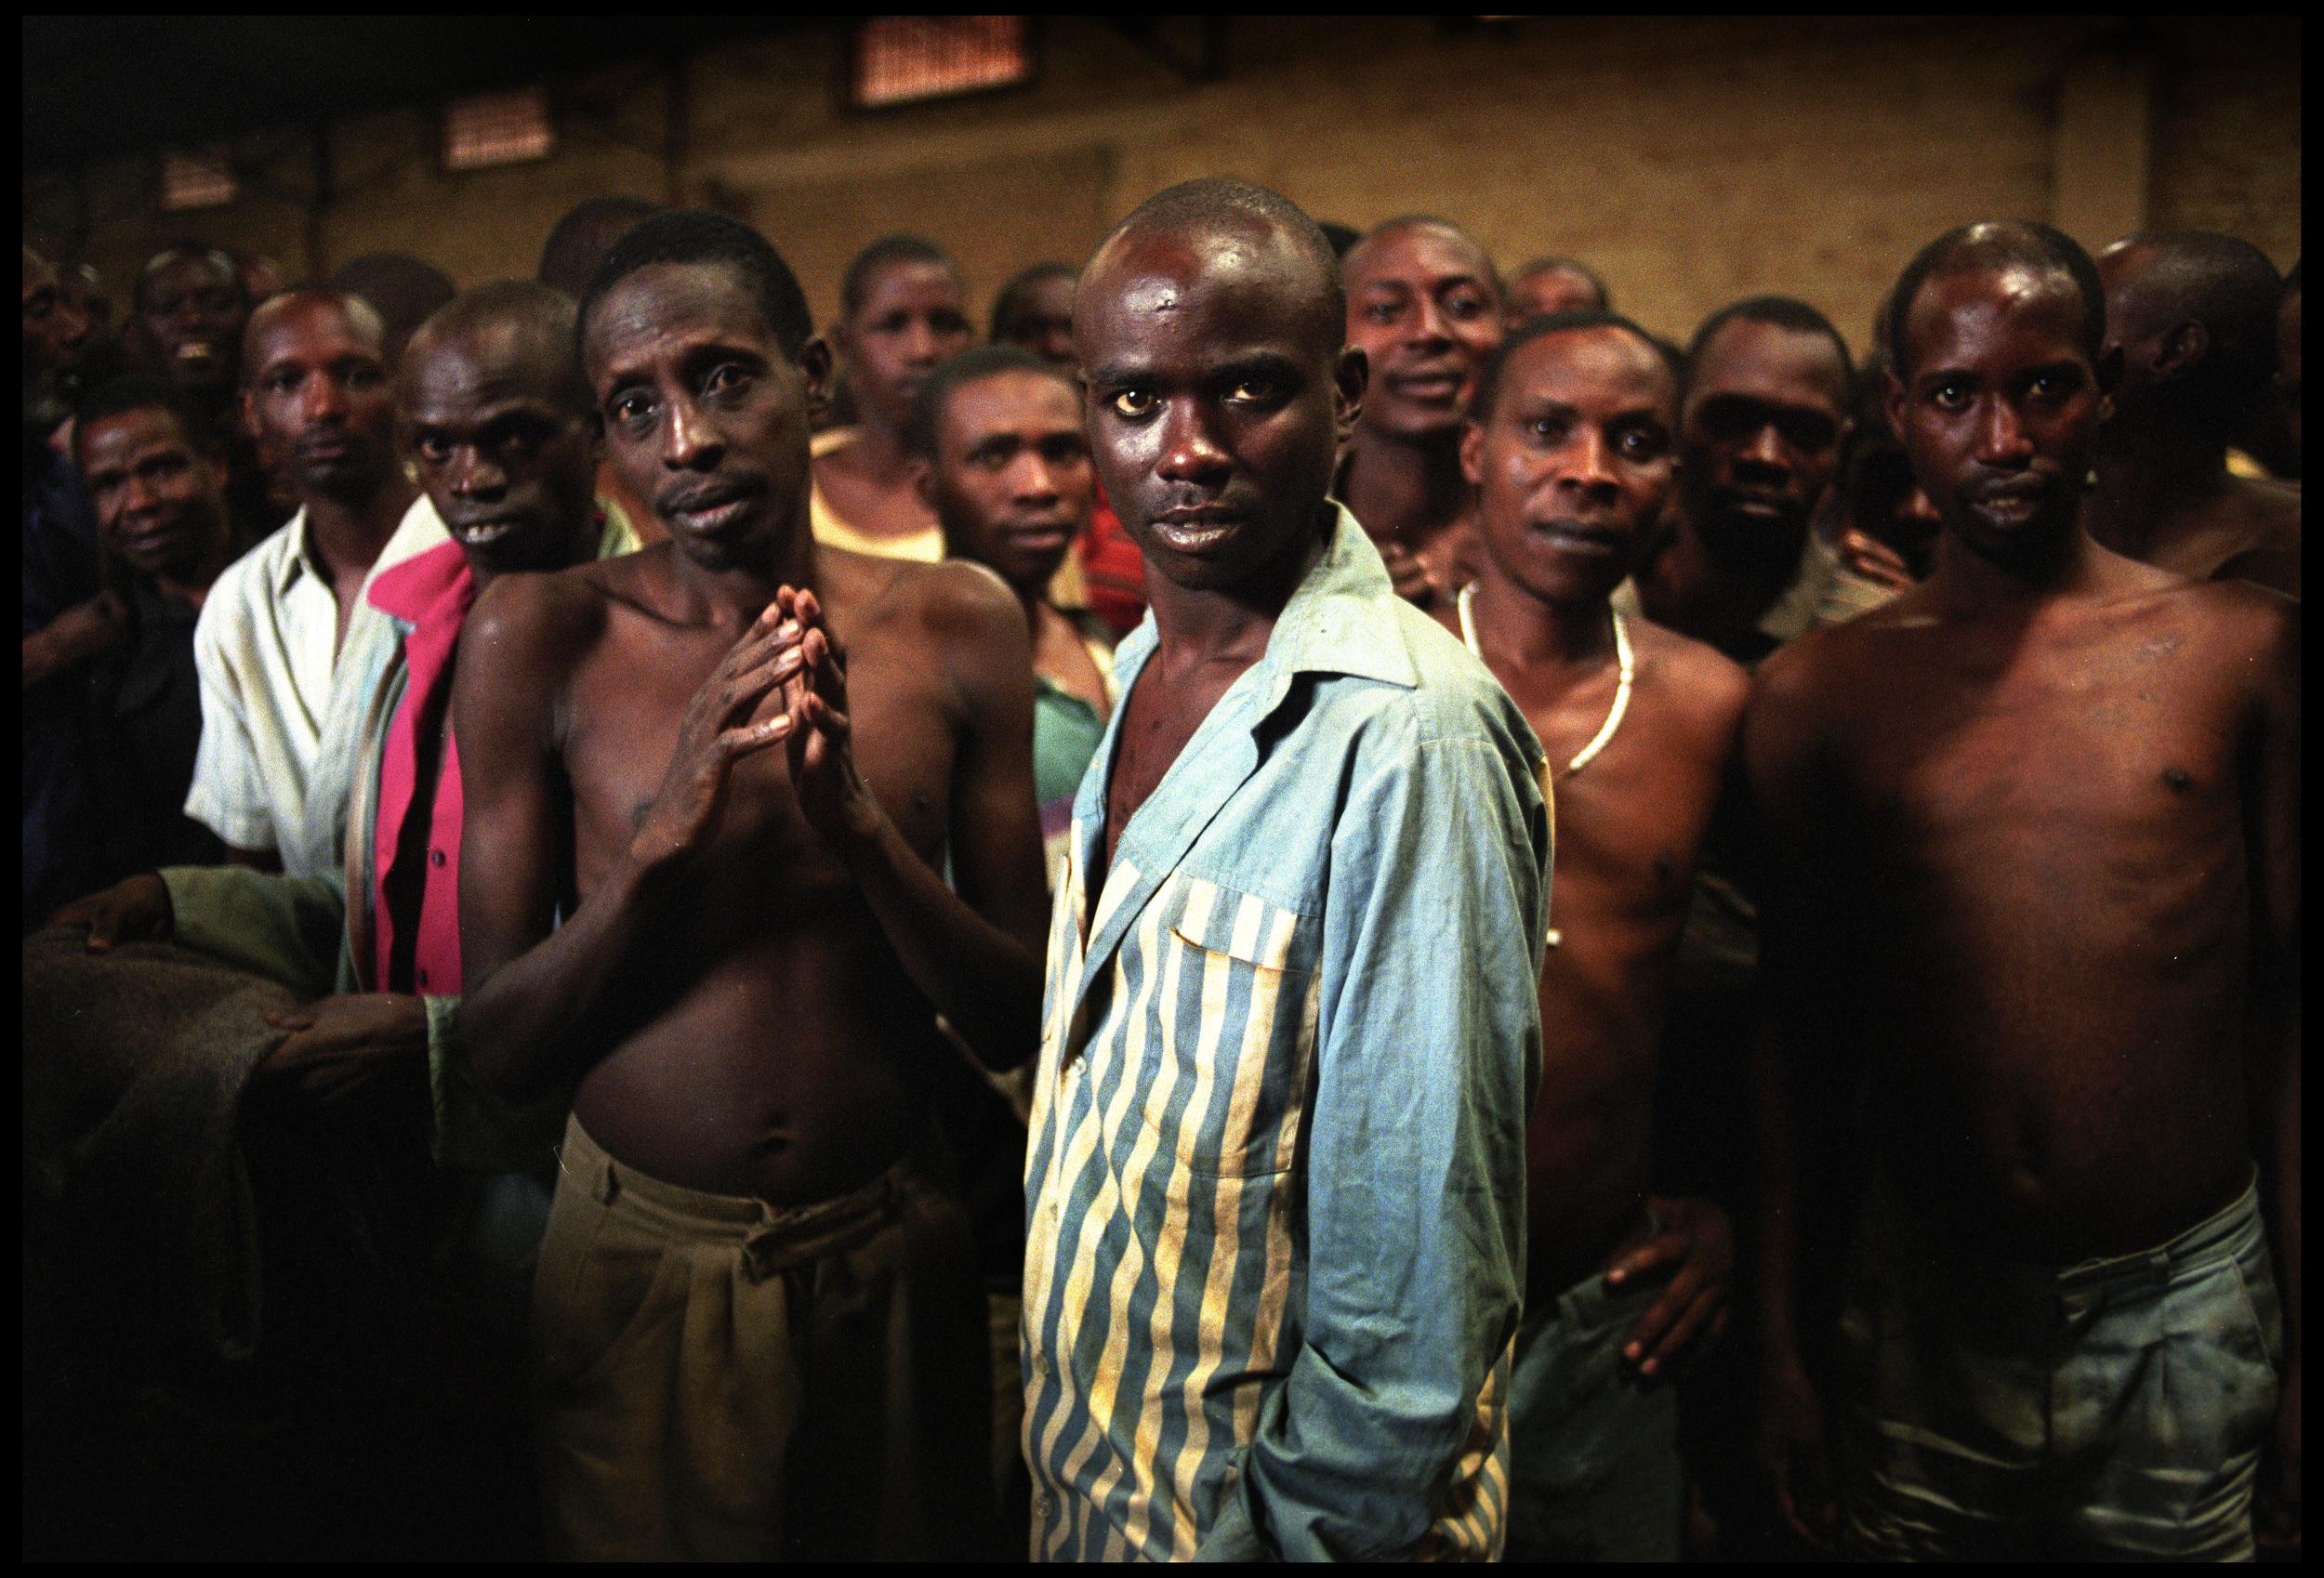 Hutu prisoners held on genocide related charges, Rwandex prison, Butare, Rwanda